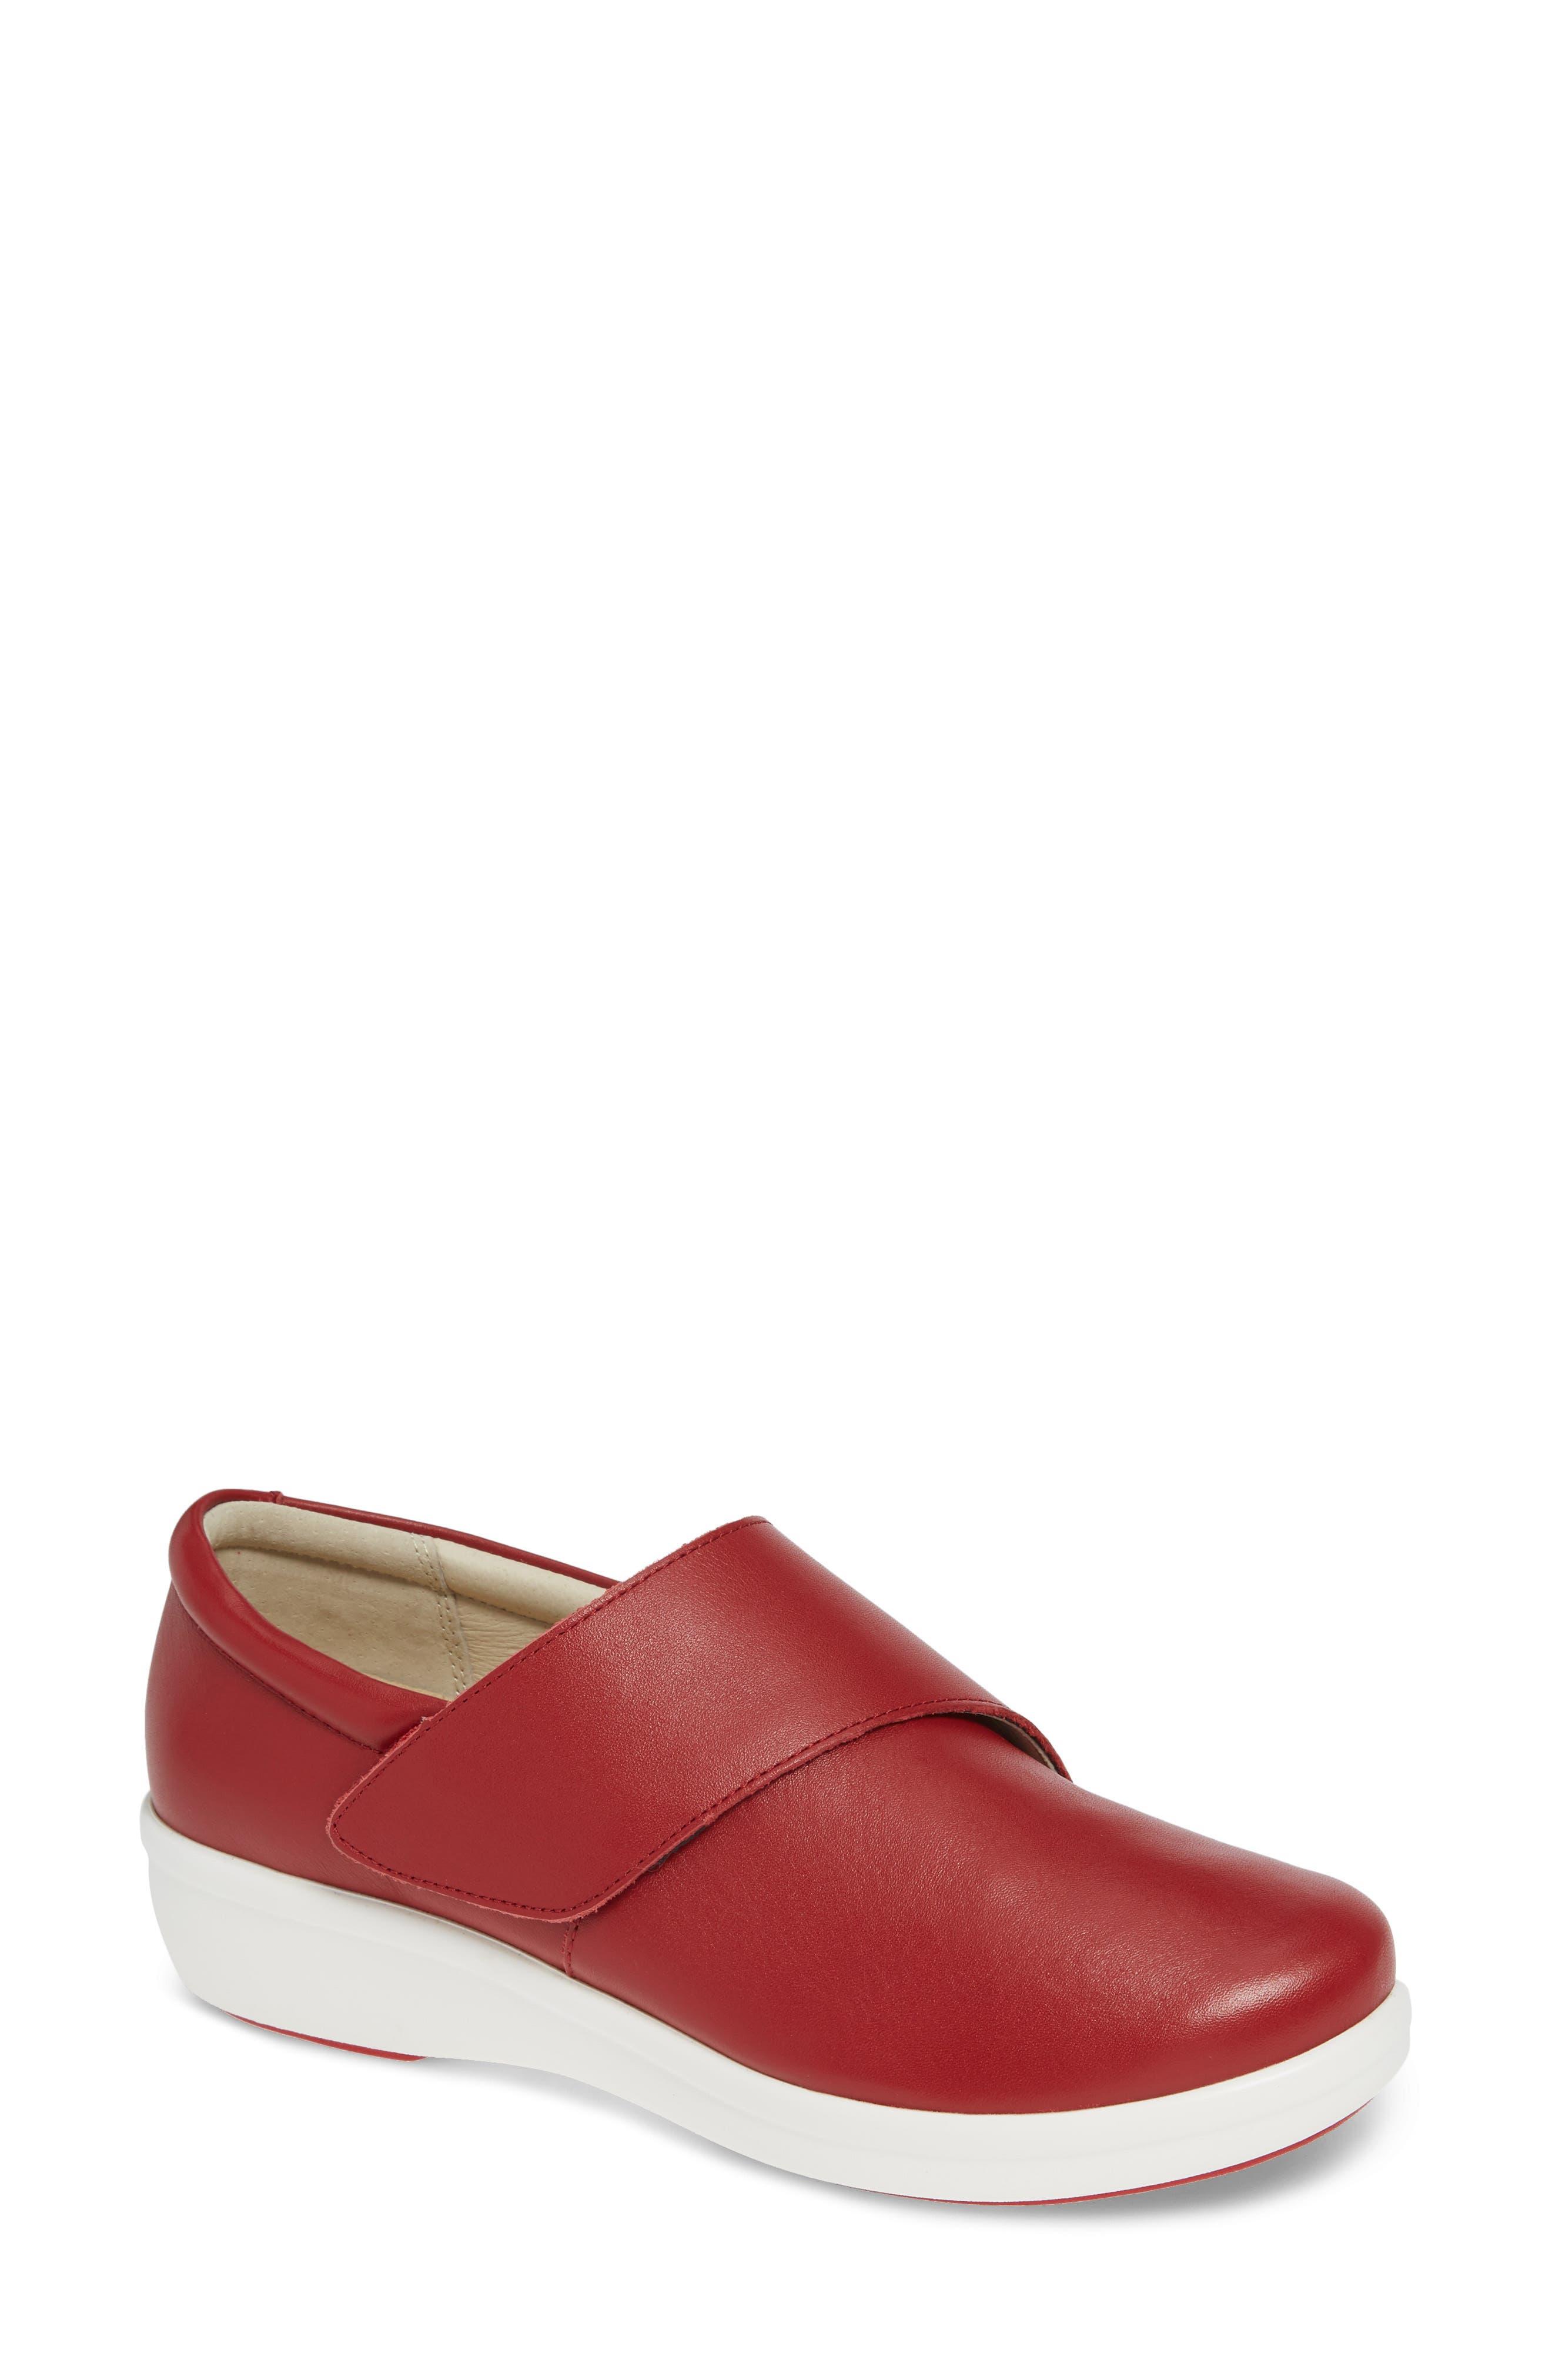 Alegria Qin Slip-On, Red